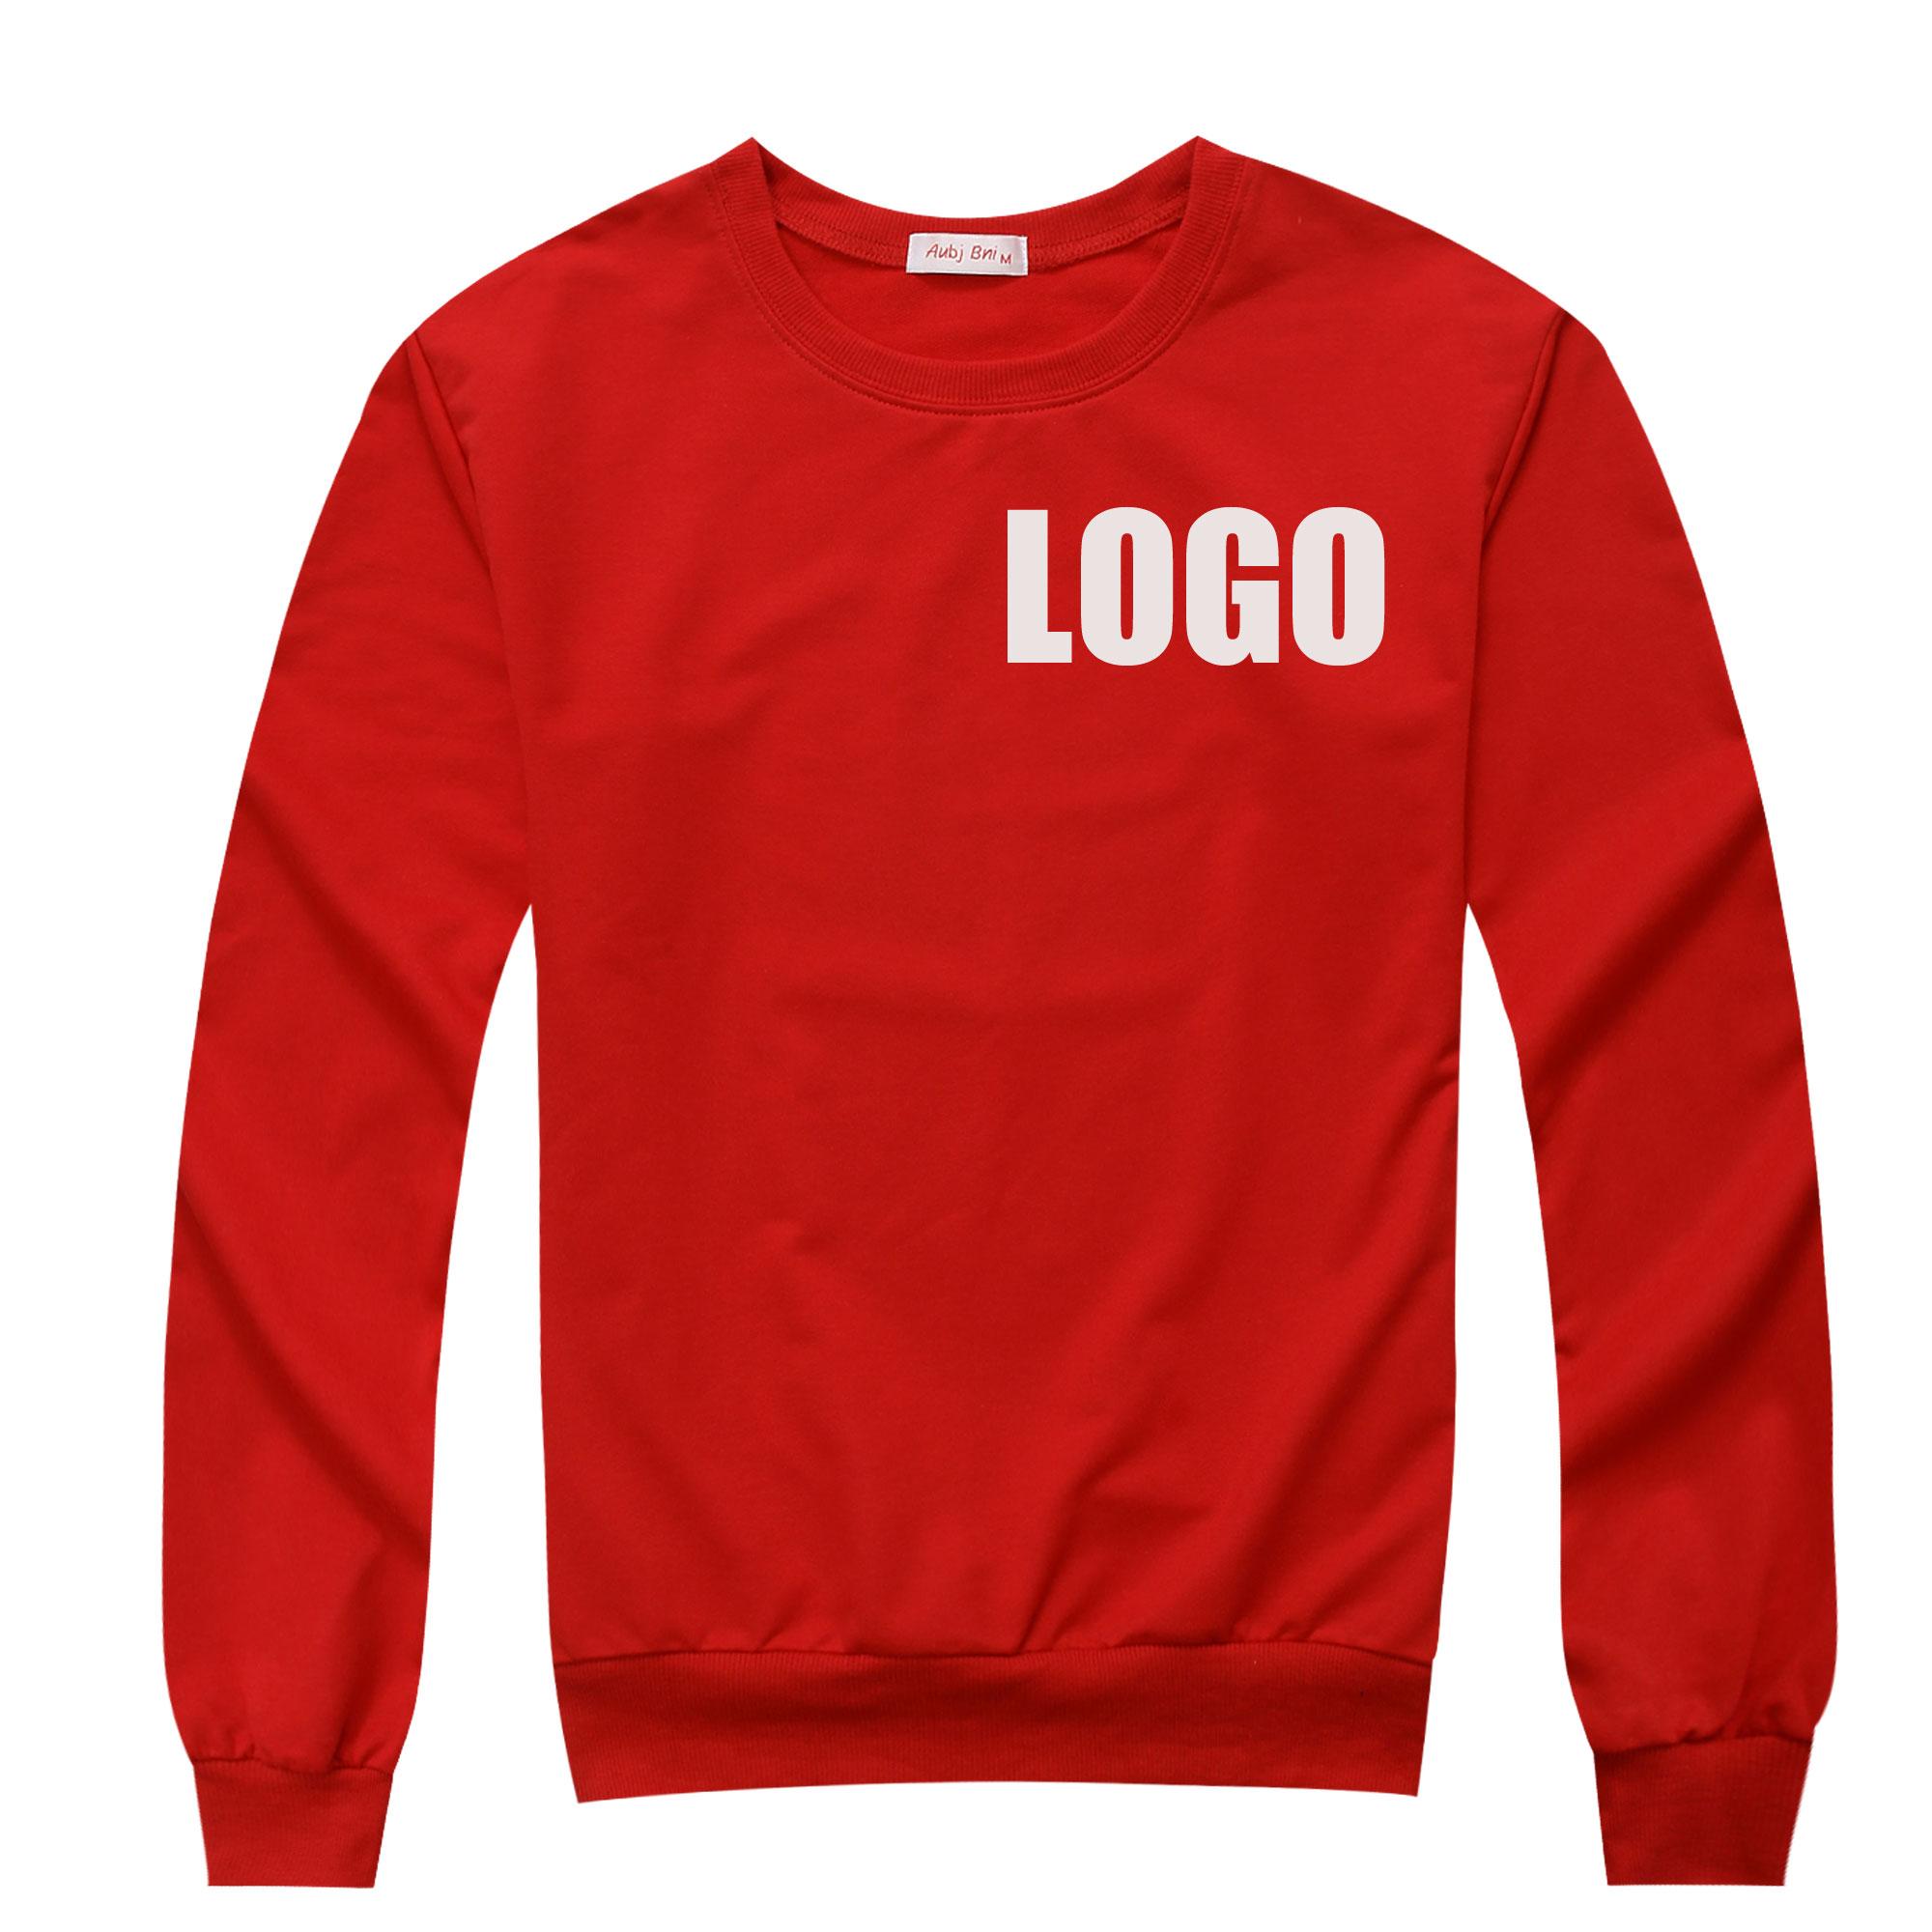 Custom logo DIY sweatshirt long sleeve pullover 250g hoodies autumn plain personalized printing logo embroidery hoody jumper(China (Mainland))